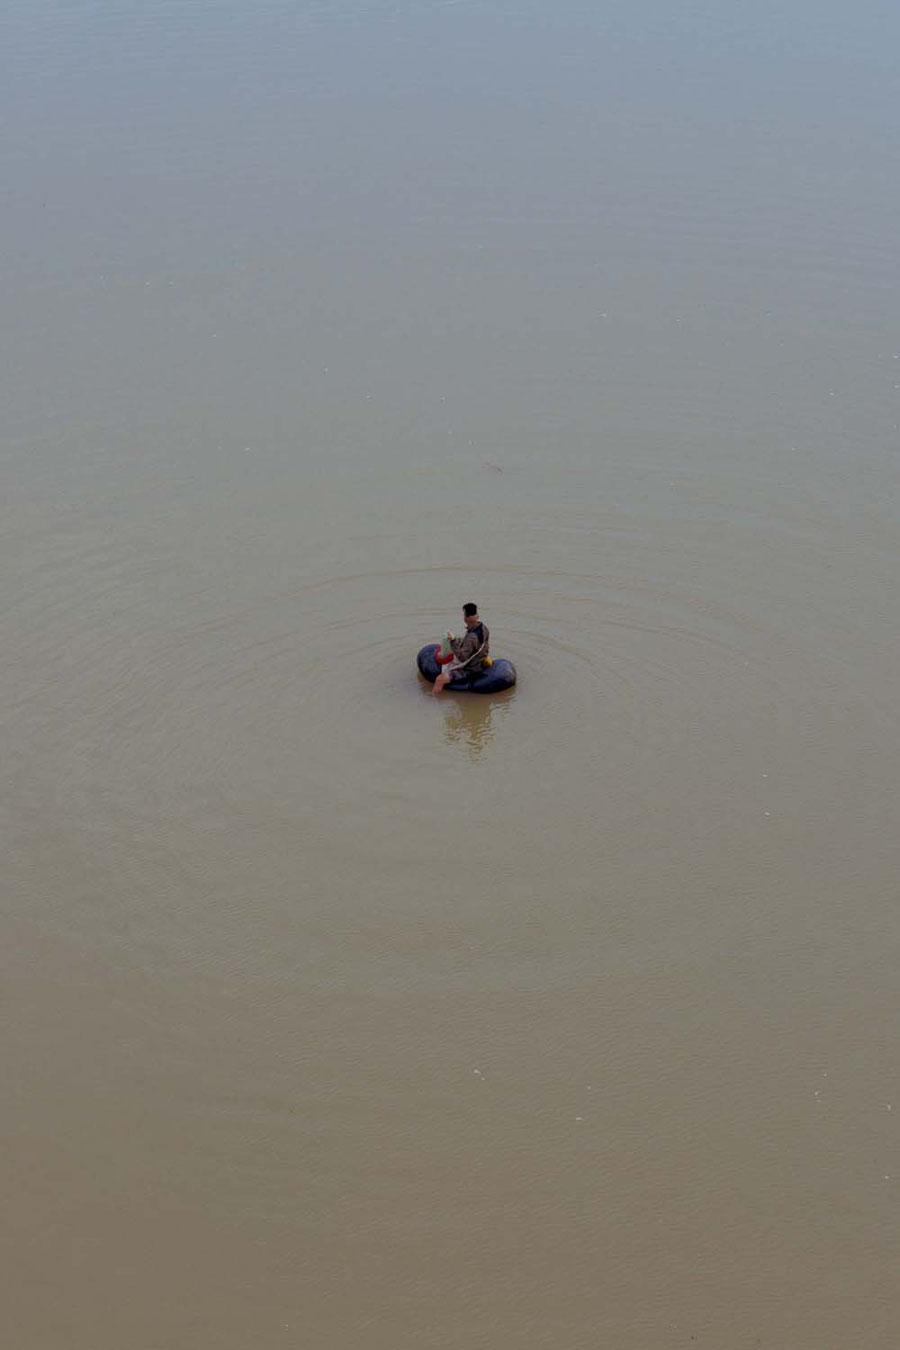 Fischer auf Gummiboot, Jinghong, China